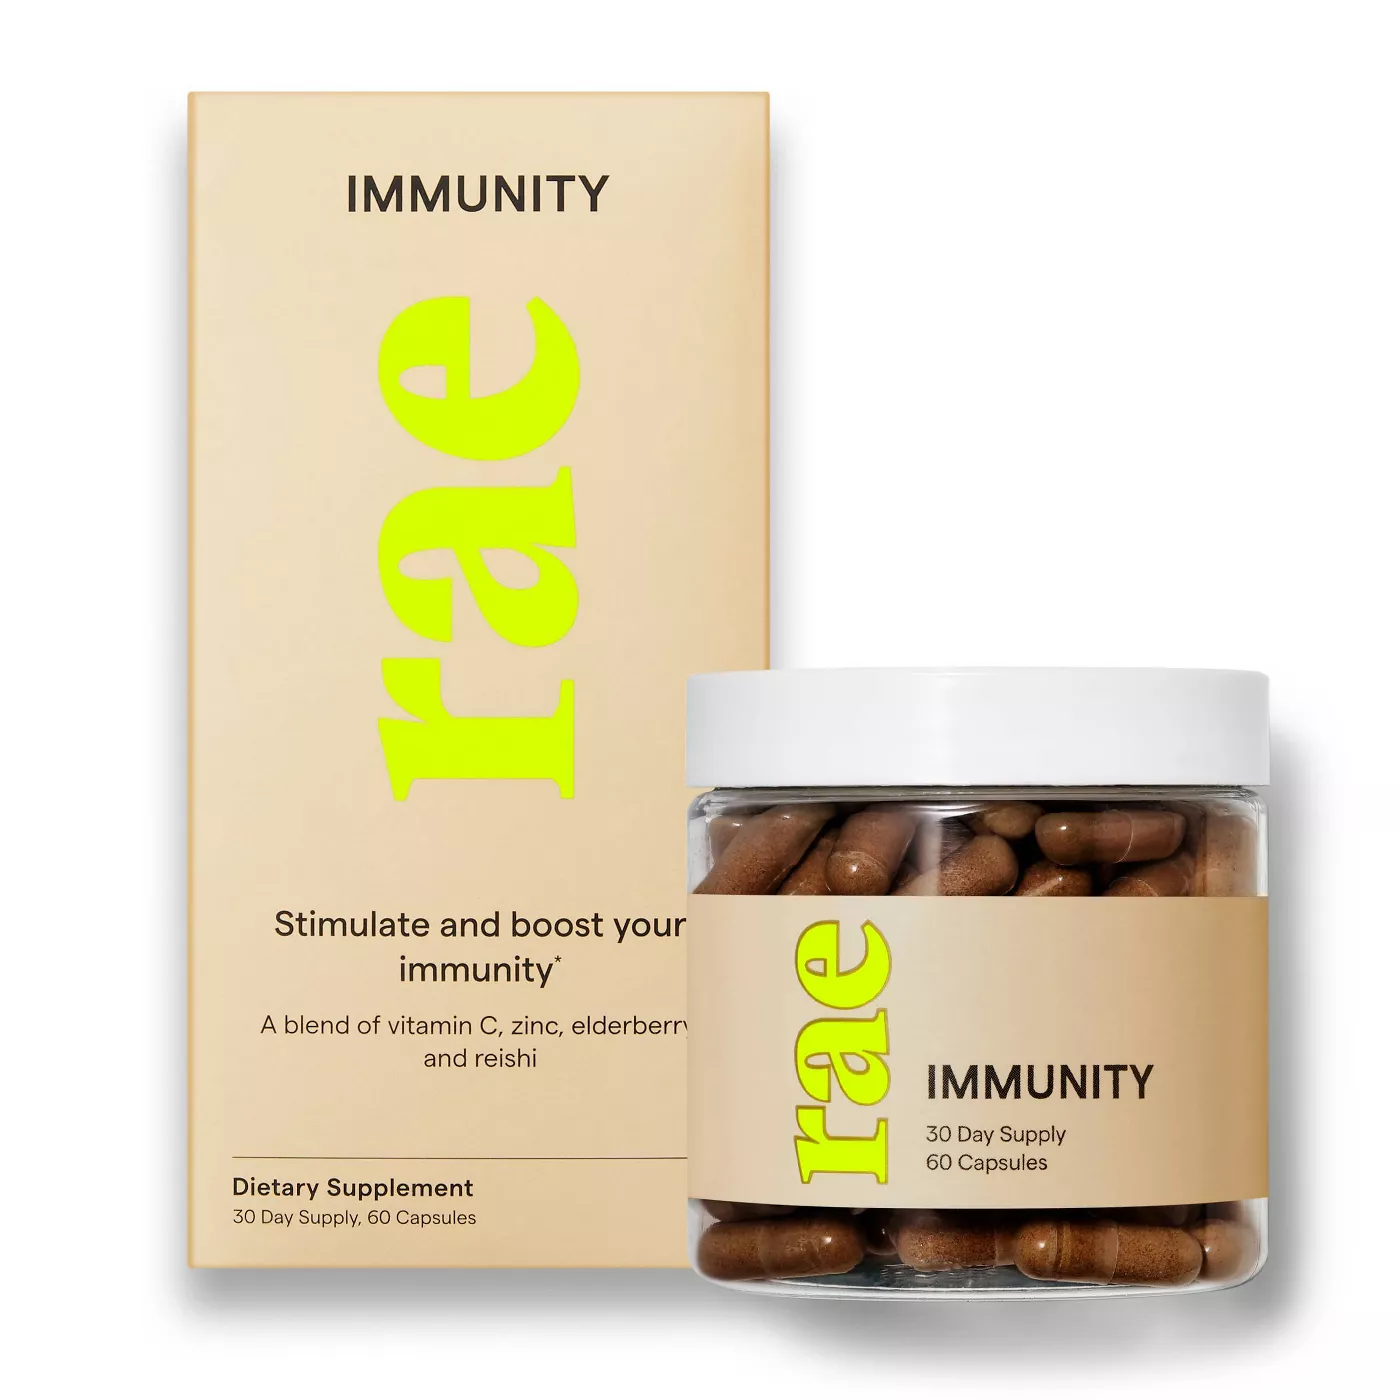 Rae Immunity Minimalist Branding